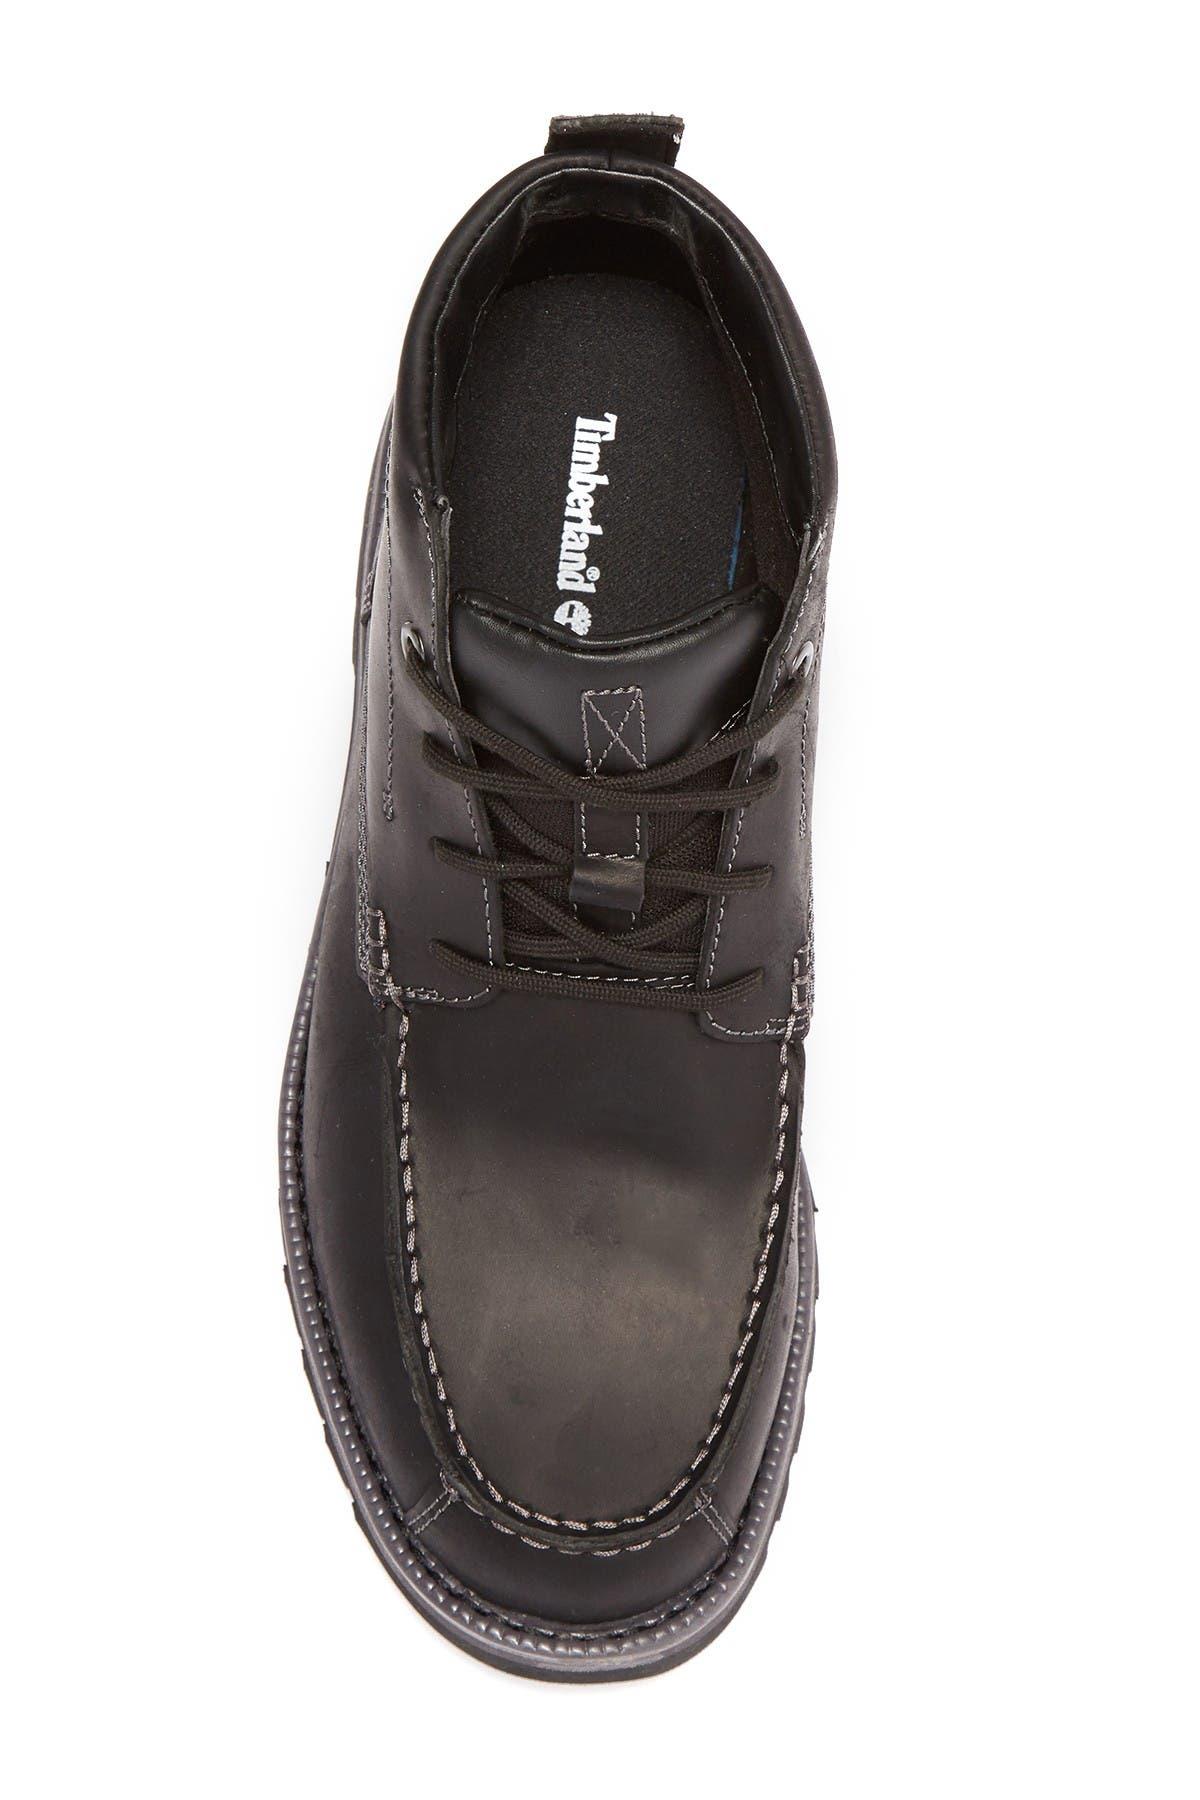 Grantly Leather Moc Toe Chukka Boot